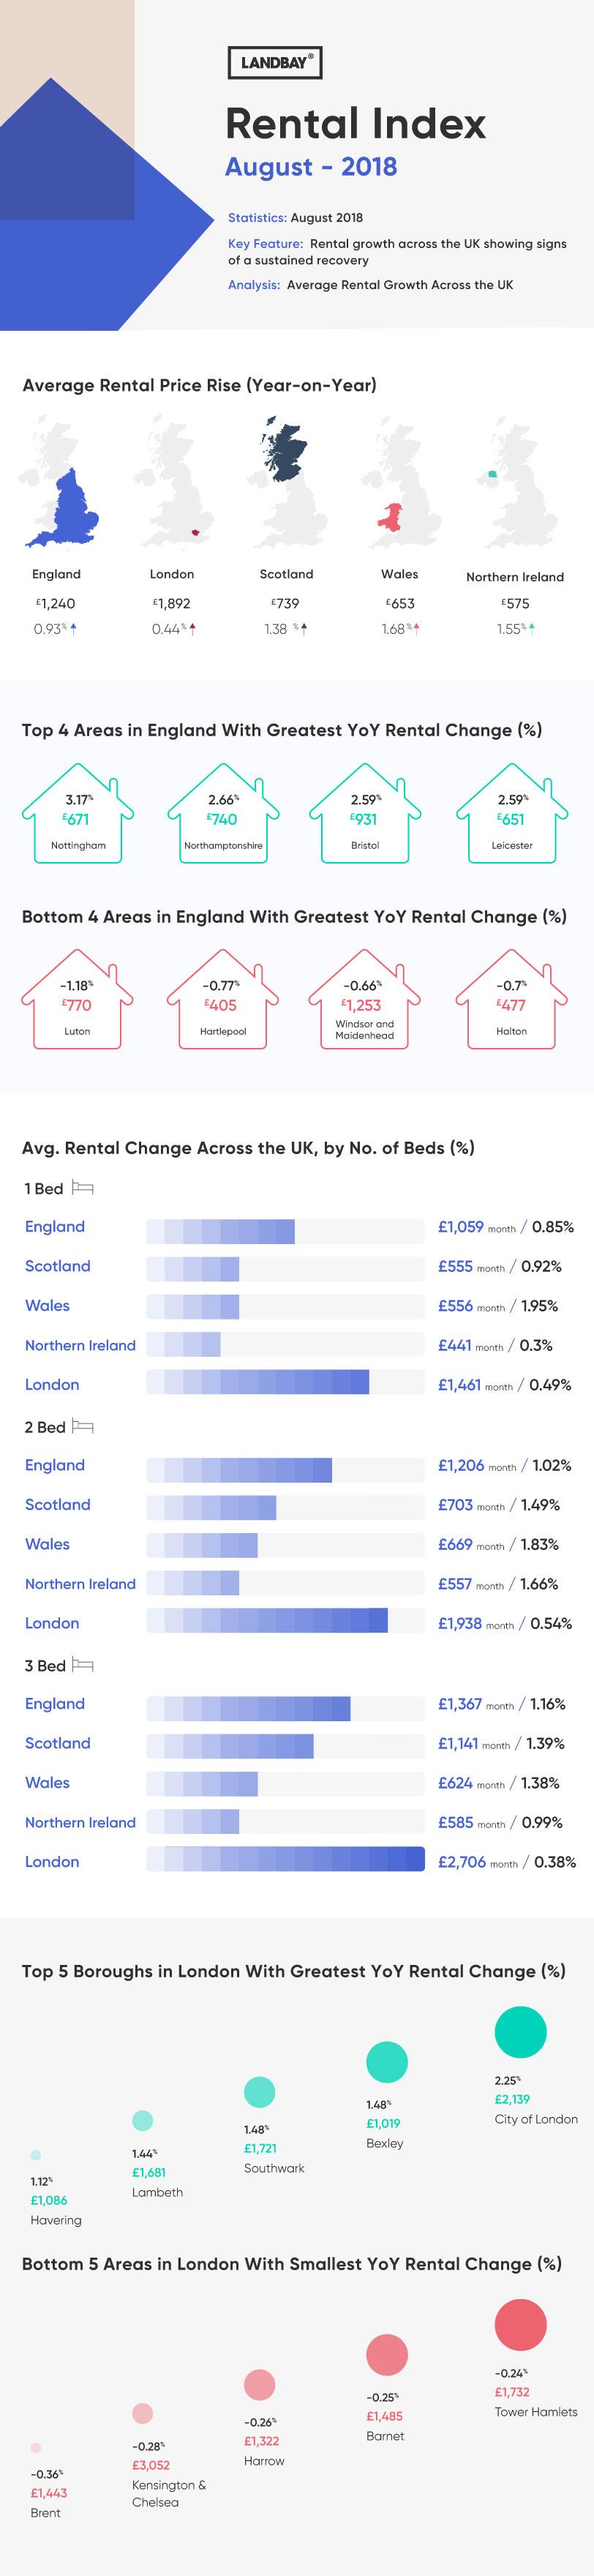 August_rental_index.jpg